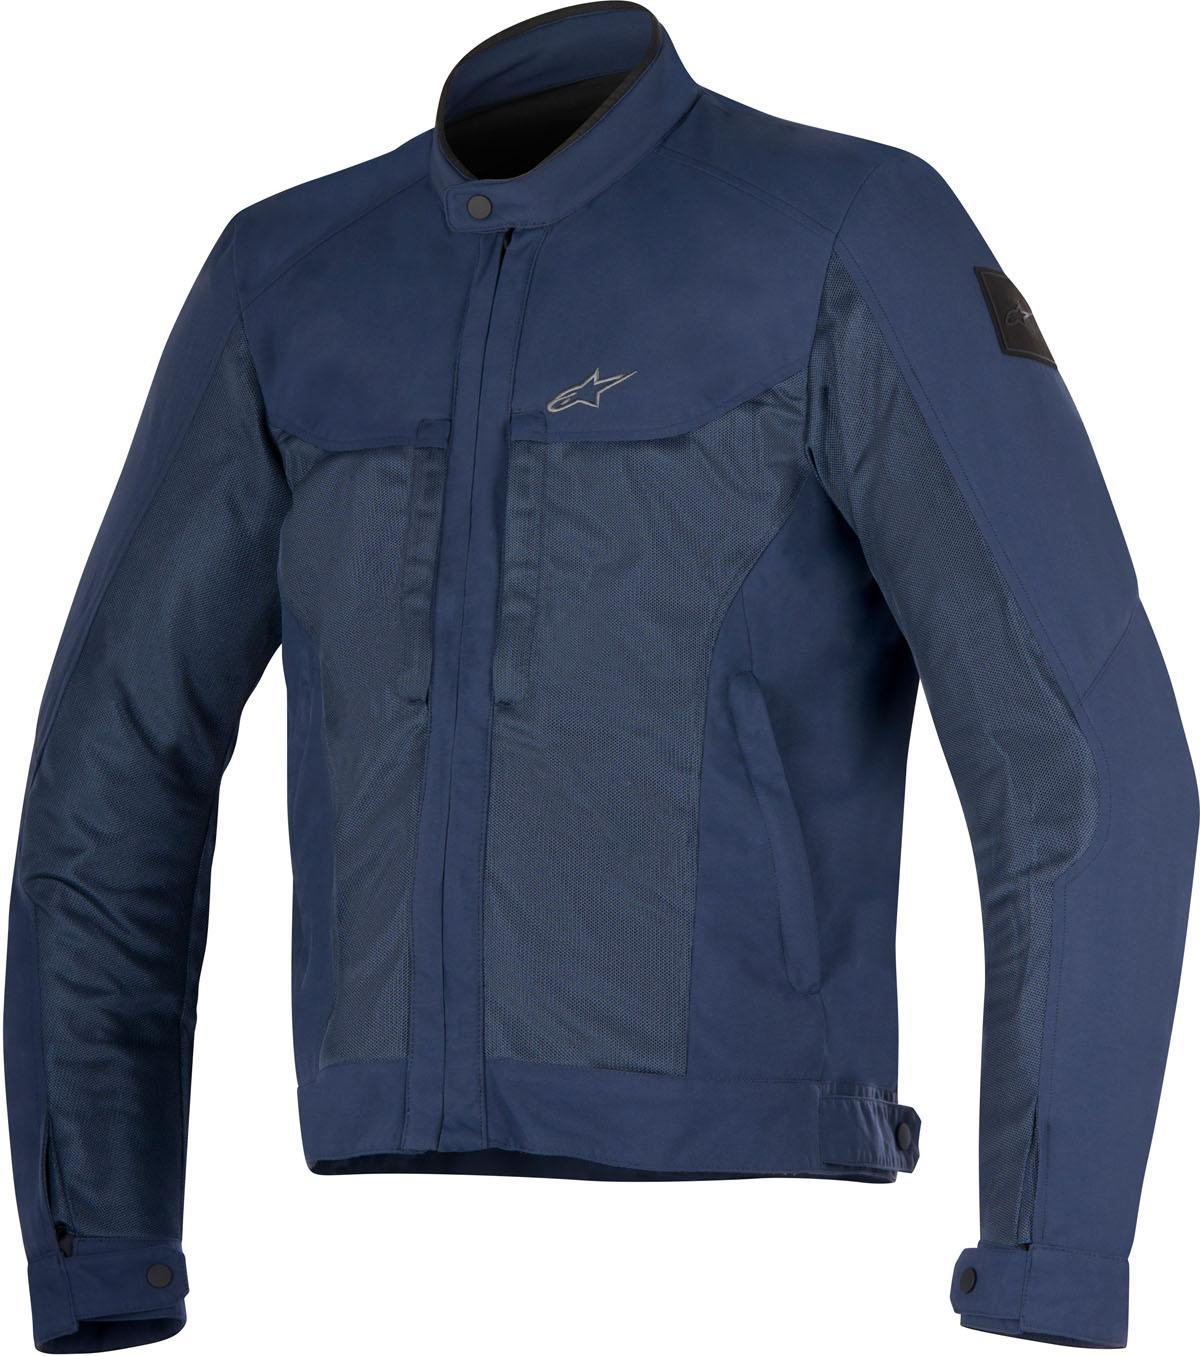 9b7c45904e6d Giacca moto estiva Alpinestars LUC AIR mood indigo - FERRO29 Online Store